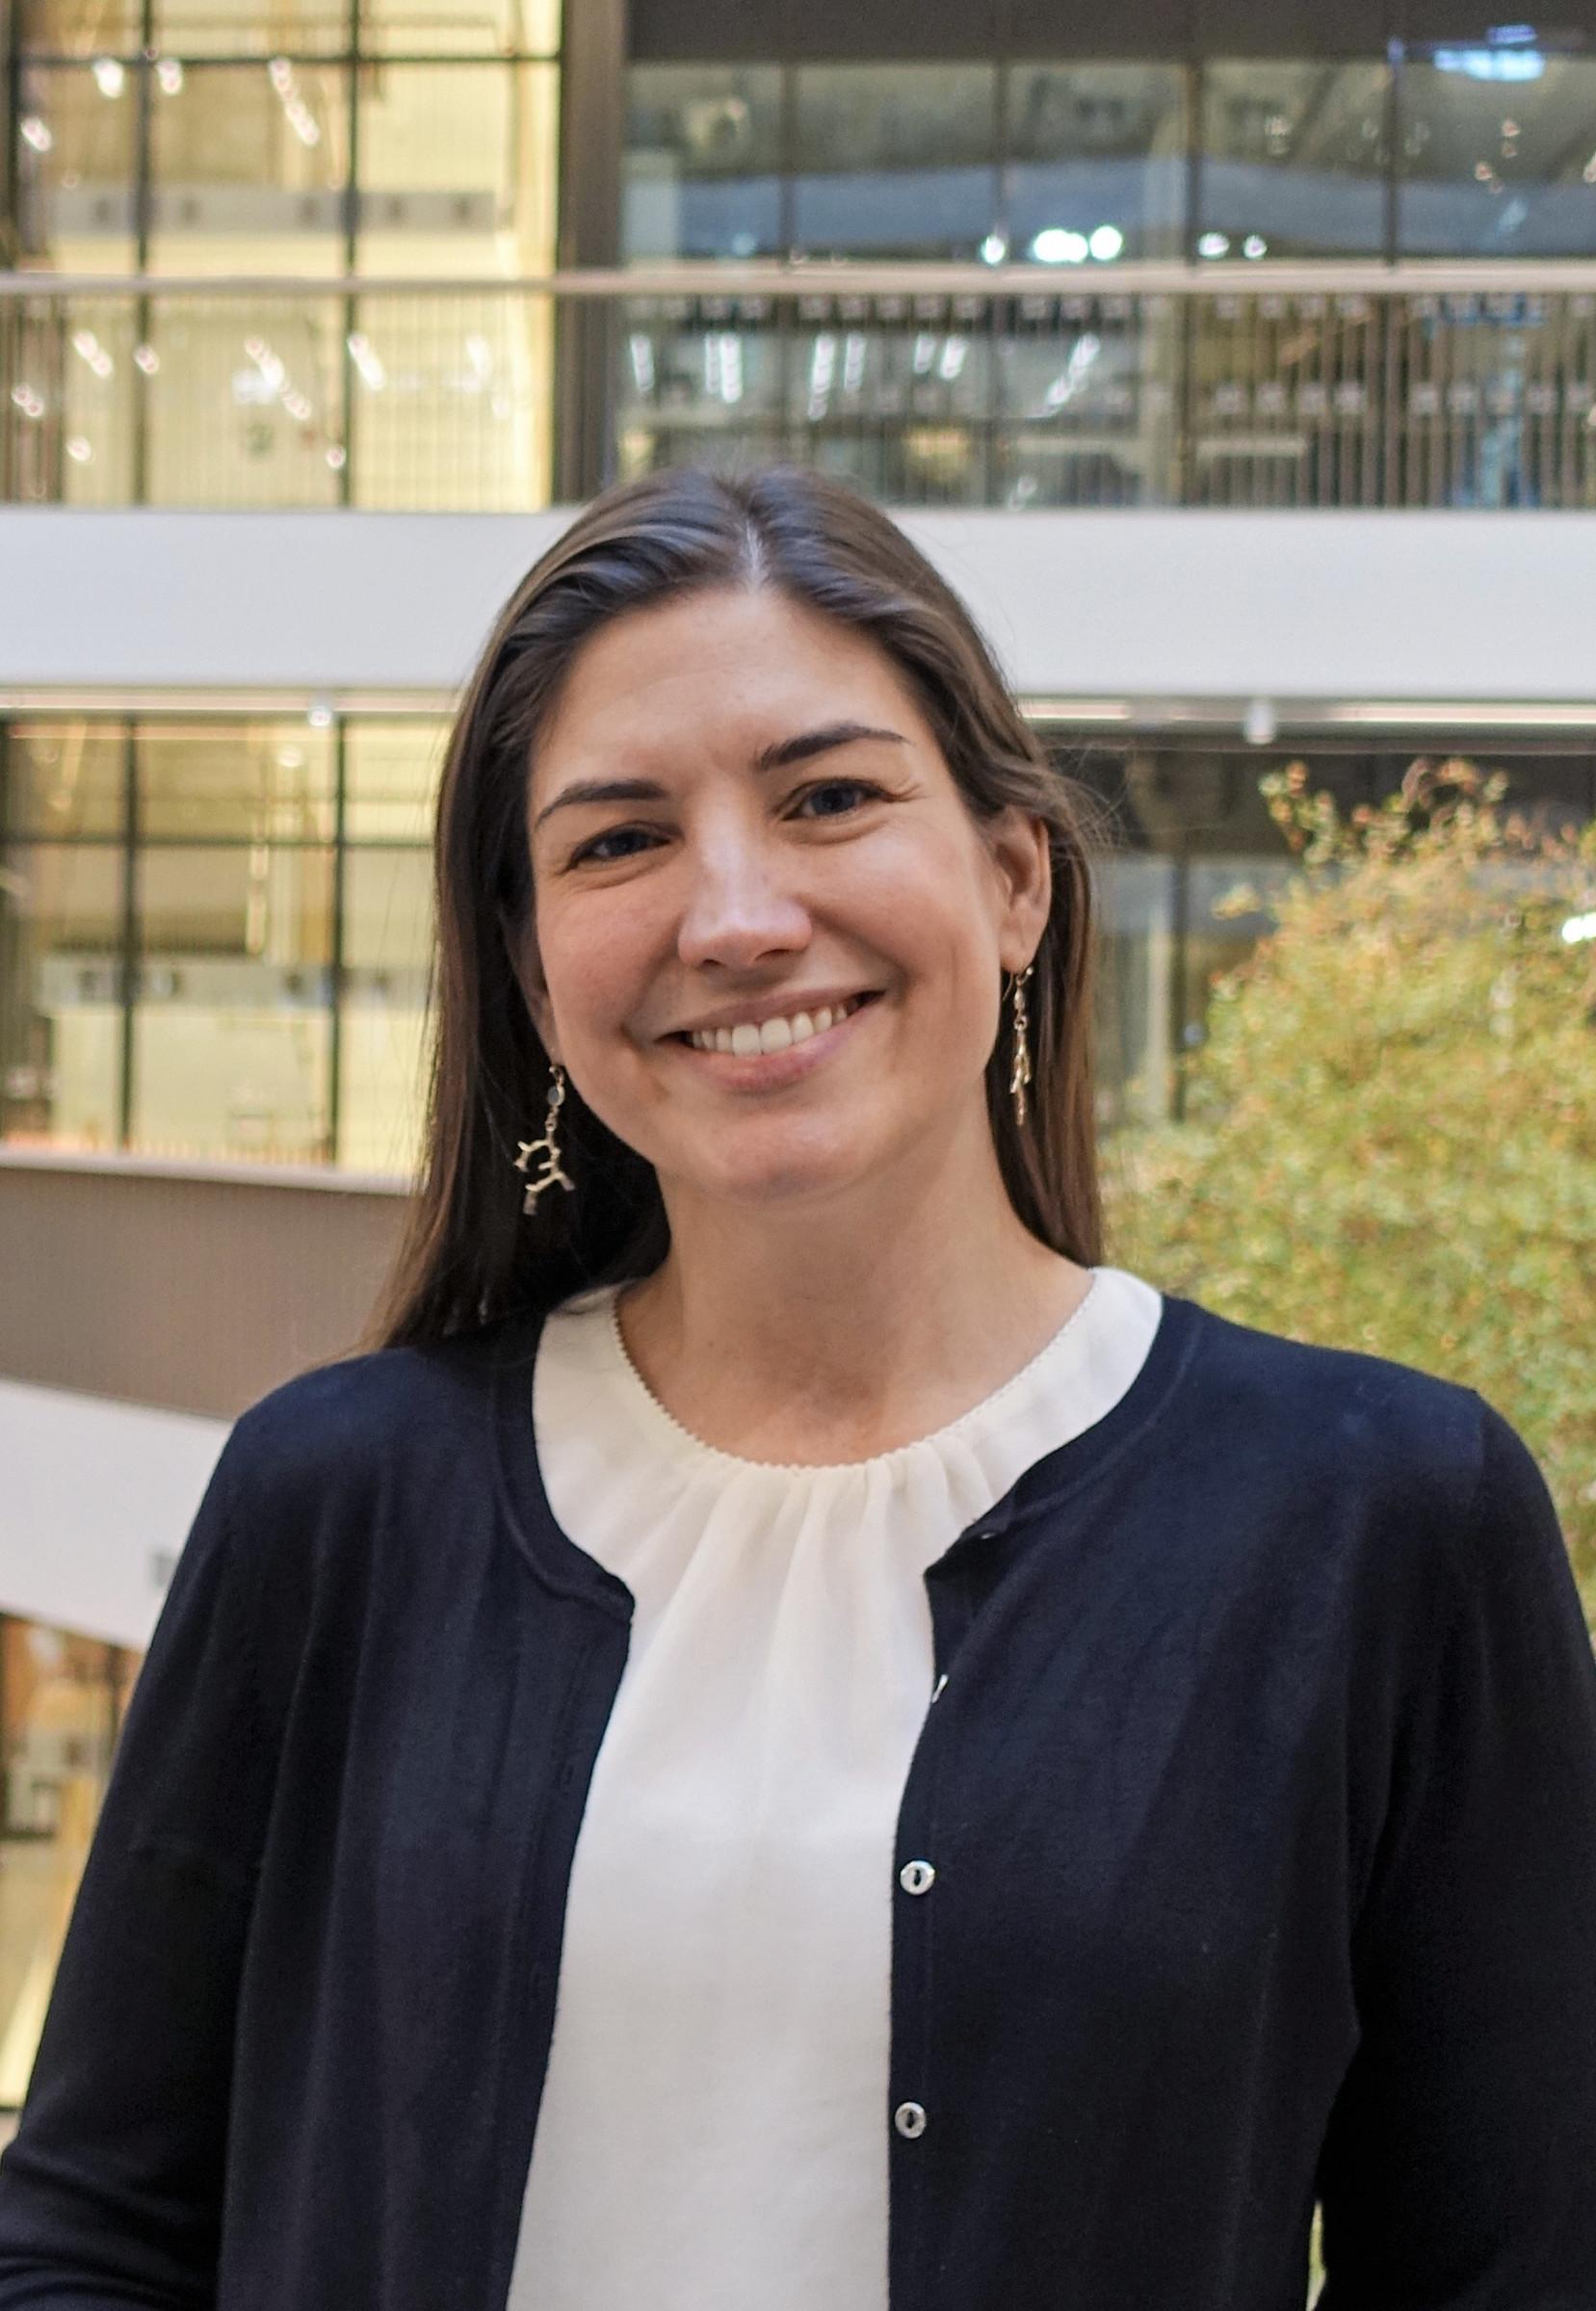 Emma Andersson, Assistant Professor, KI. Photo: © Ragnar Söderbergs stiftelse 2020.